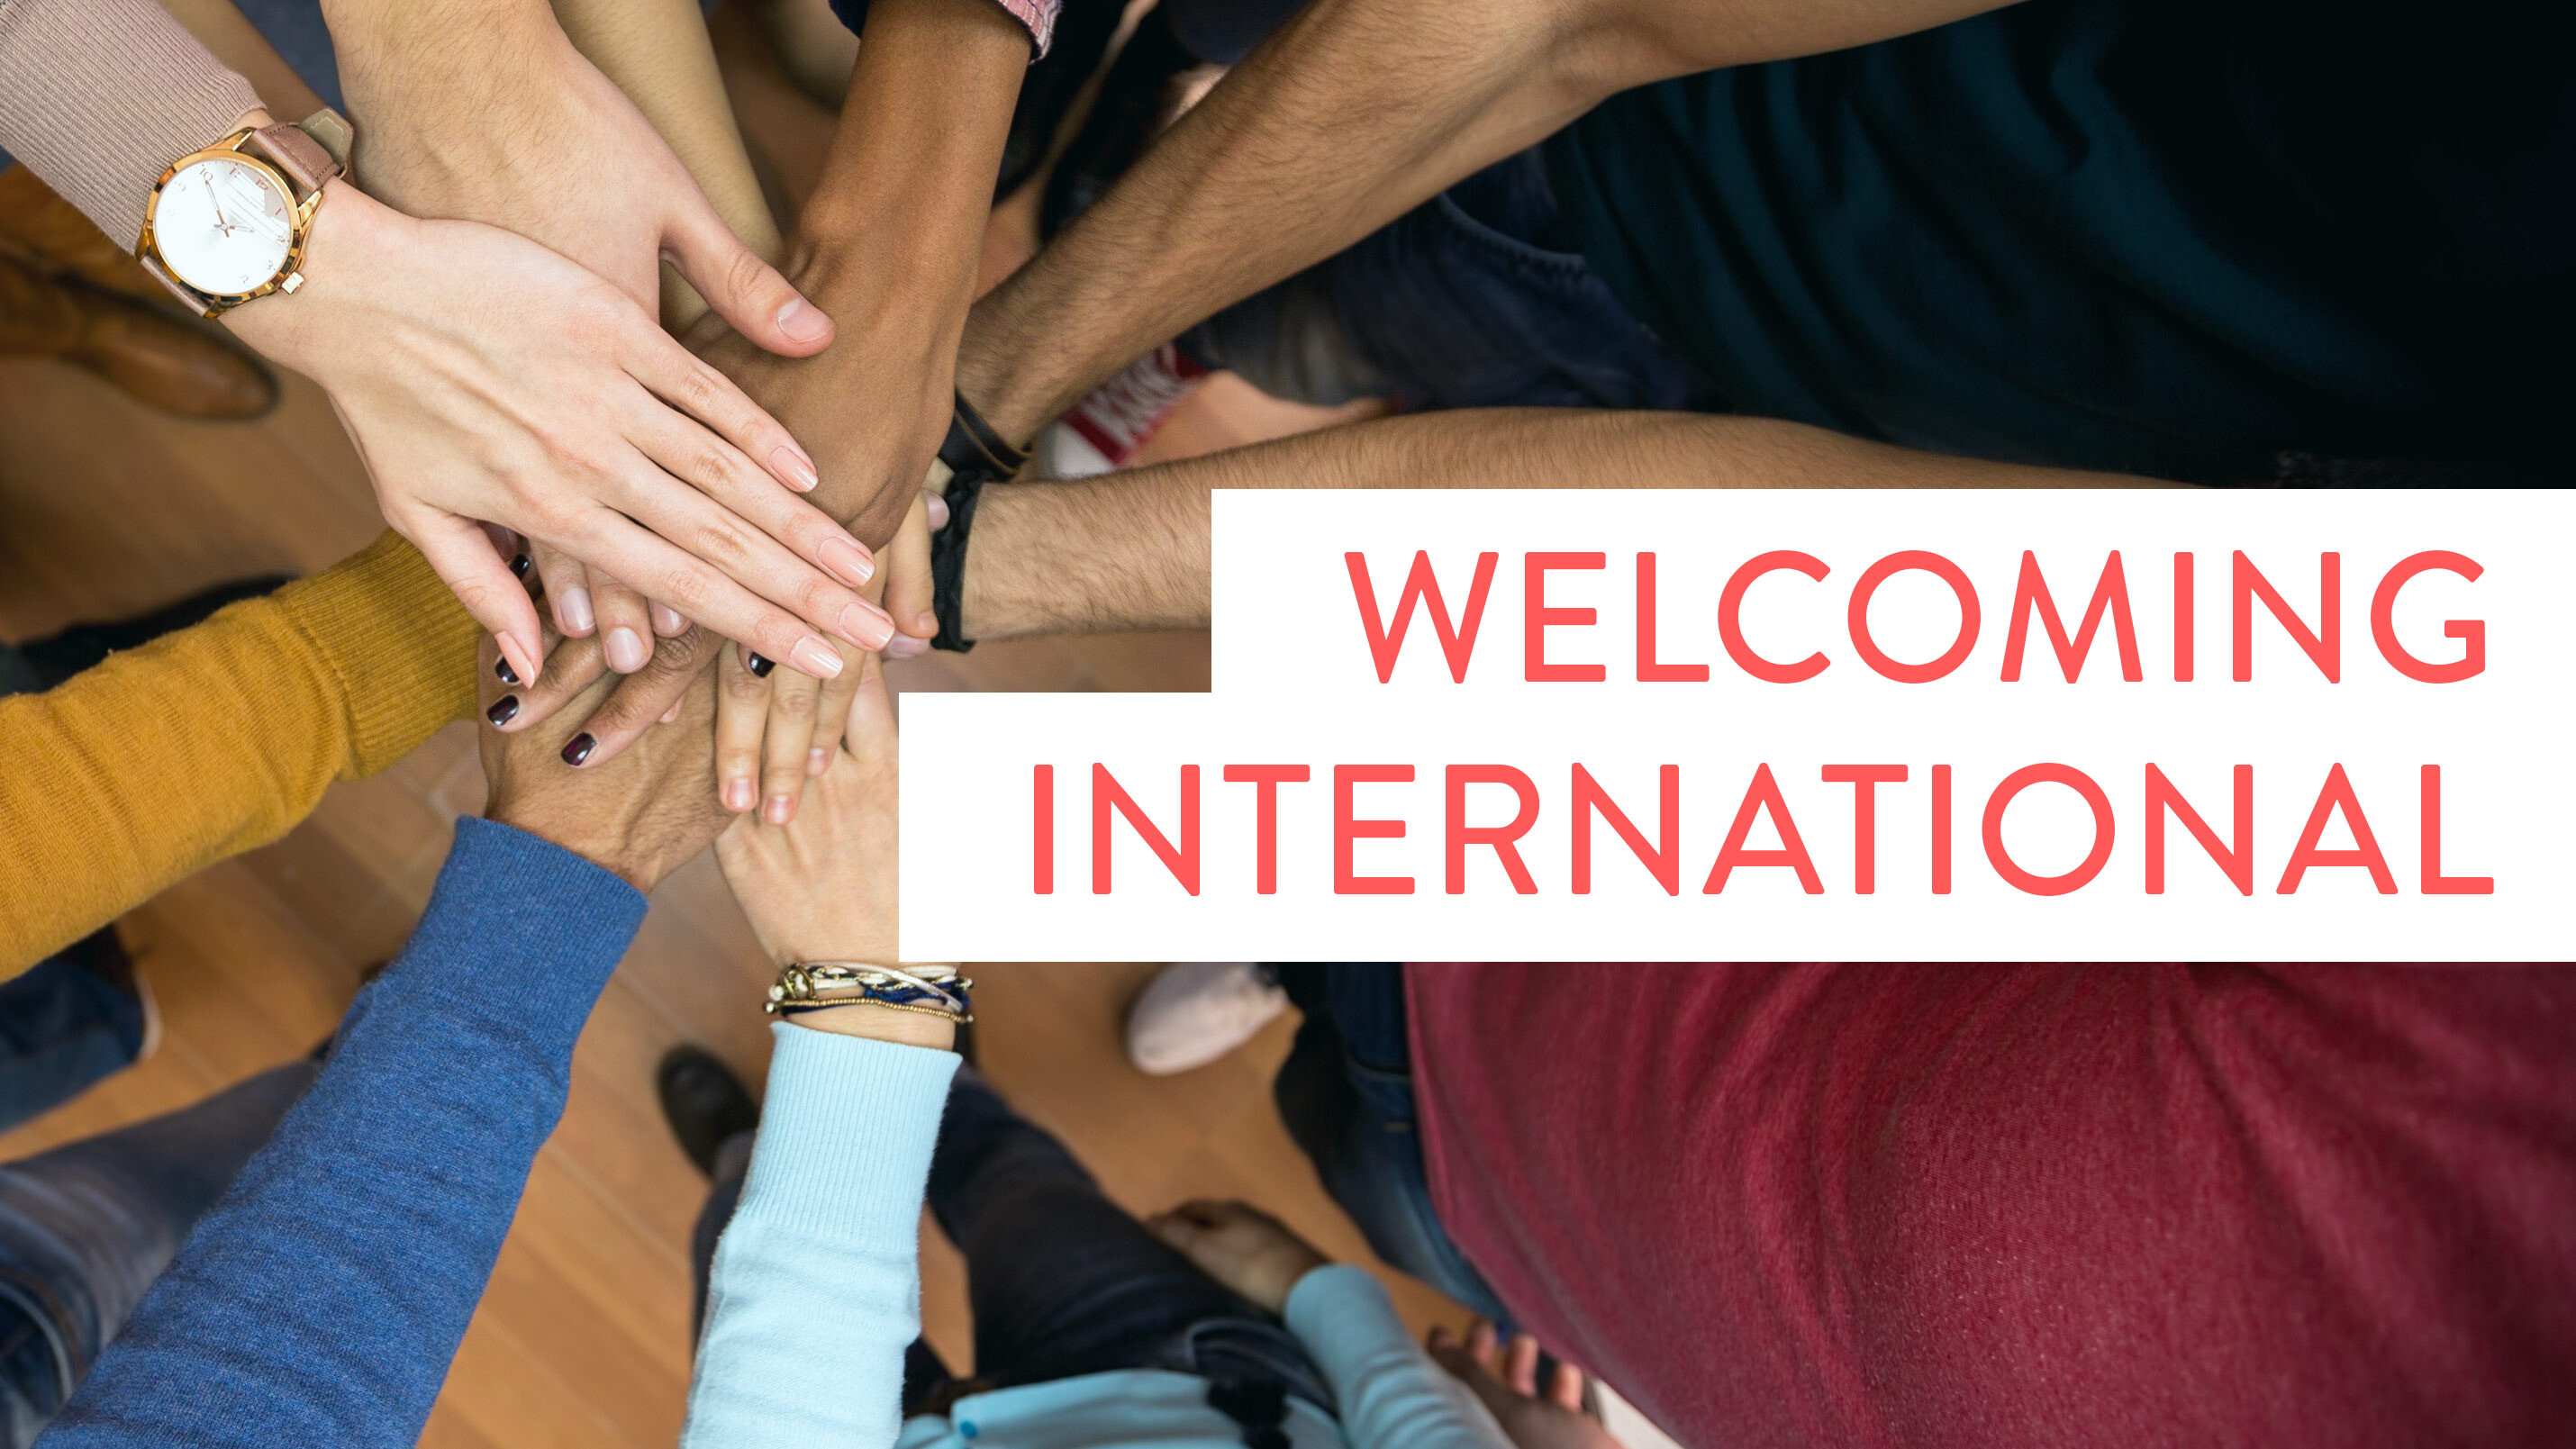 Welcoming International